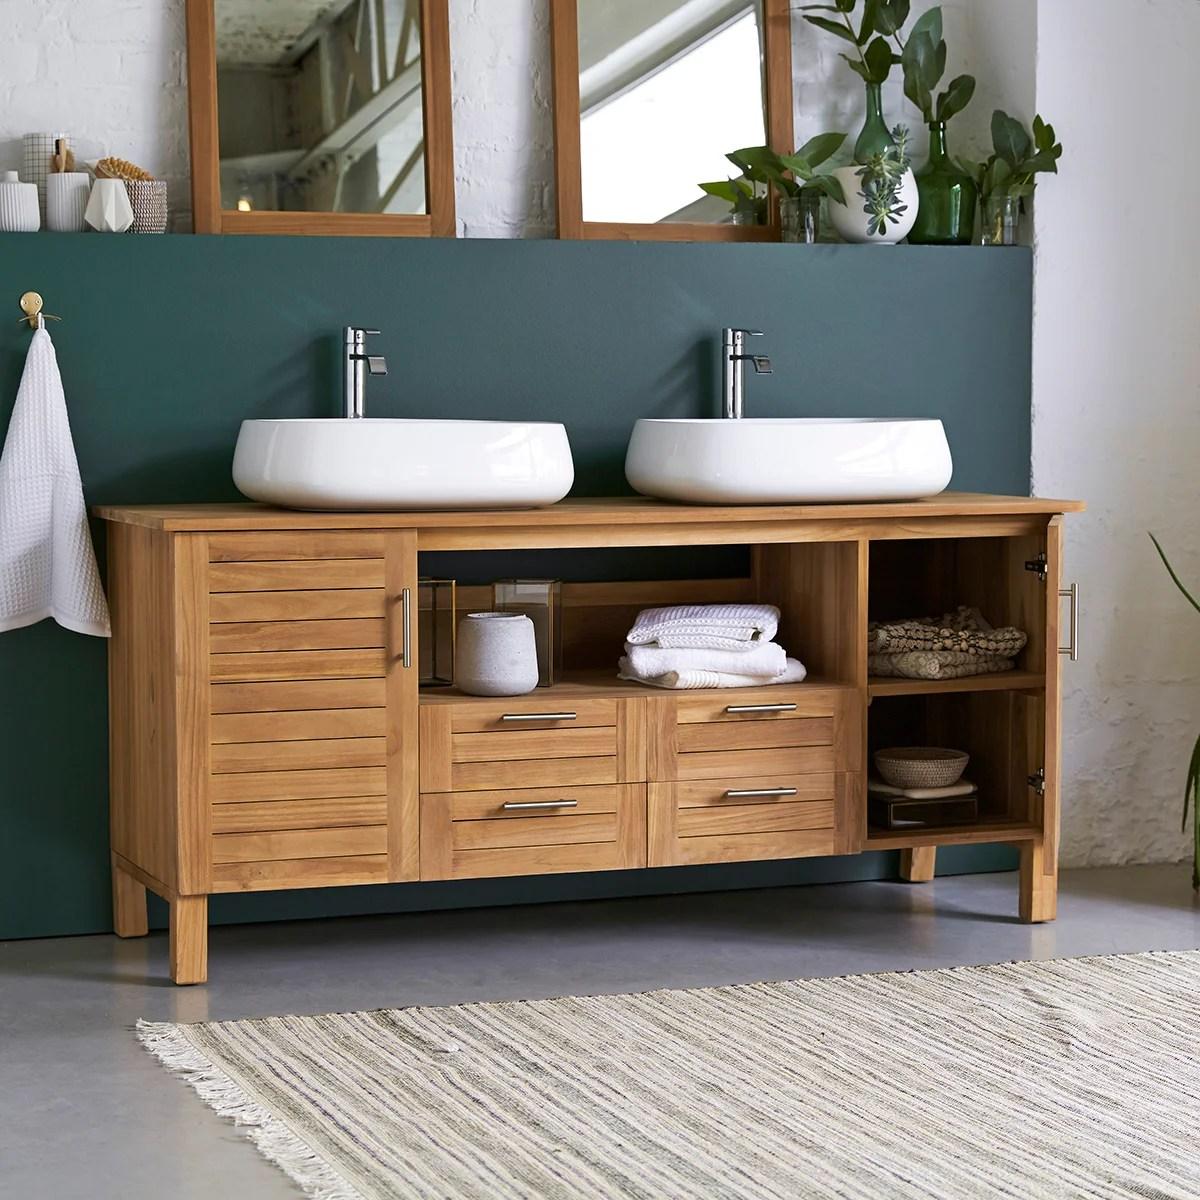 meuble de salle de bains double vasque l 165 x h 75 x p 55 cm teck soho leroy merlin